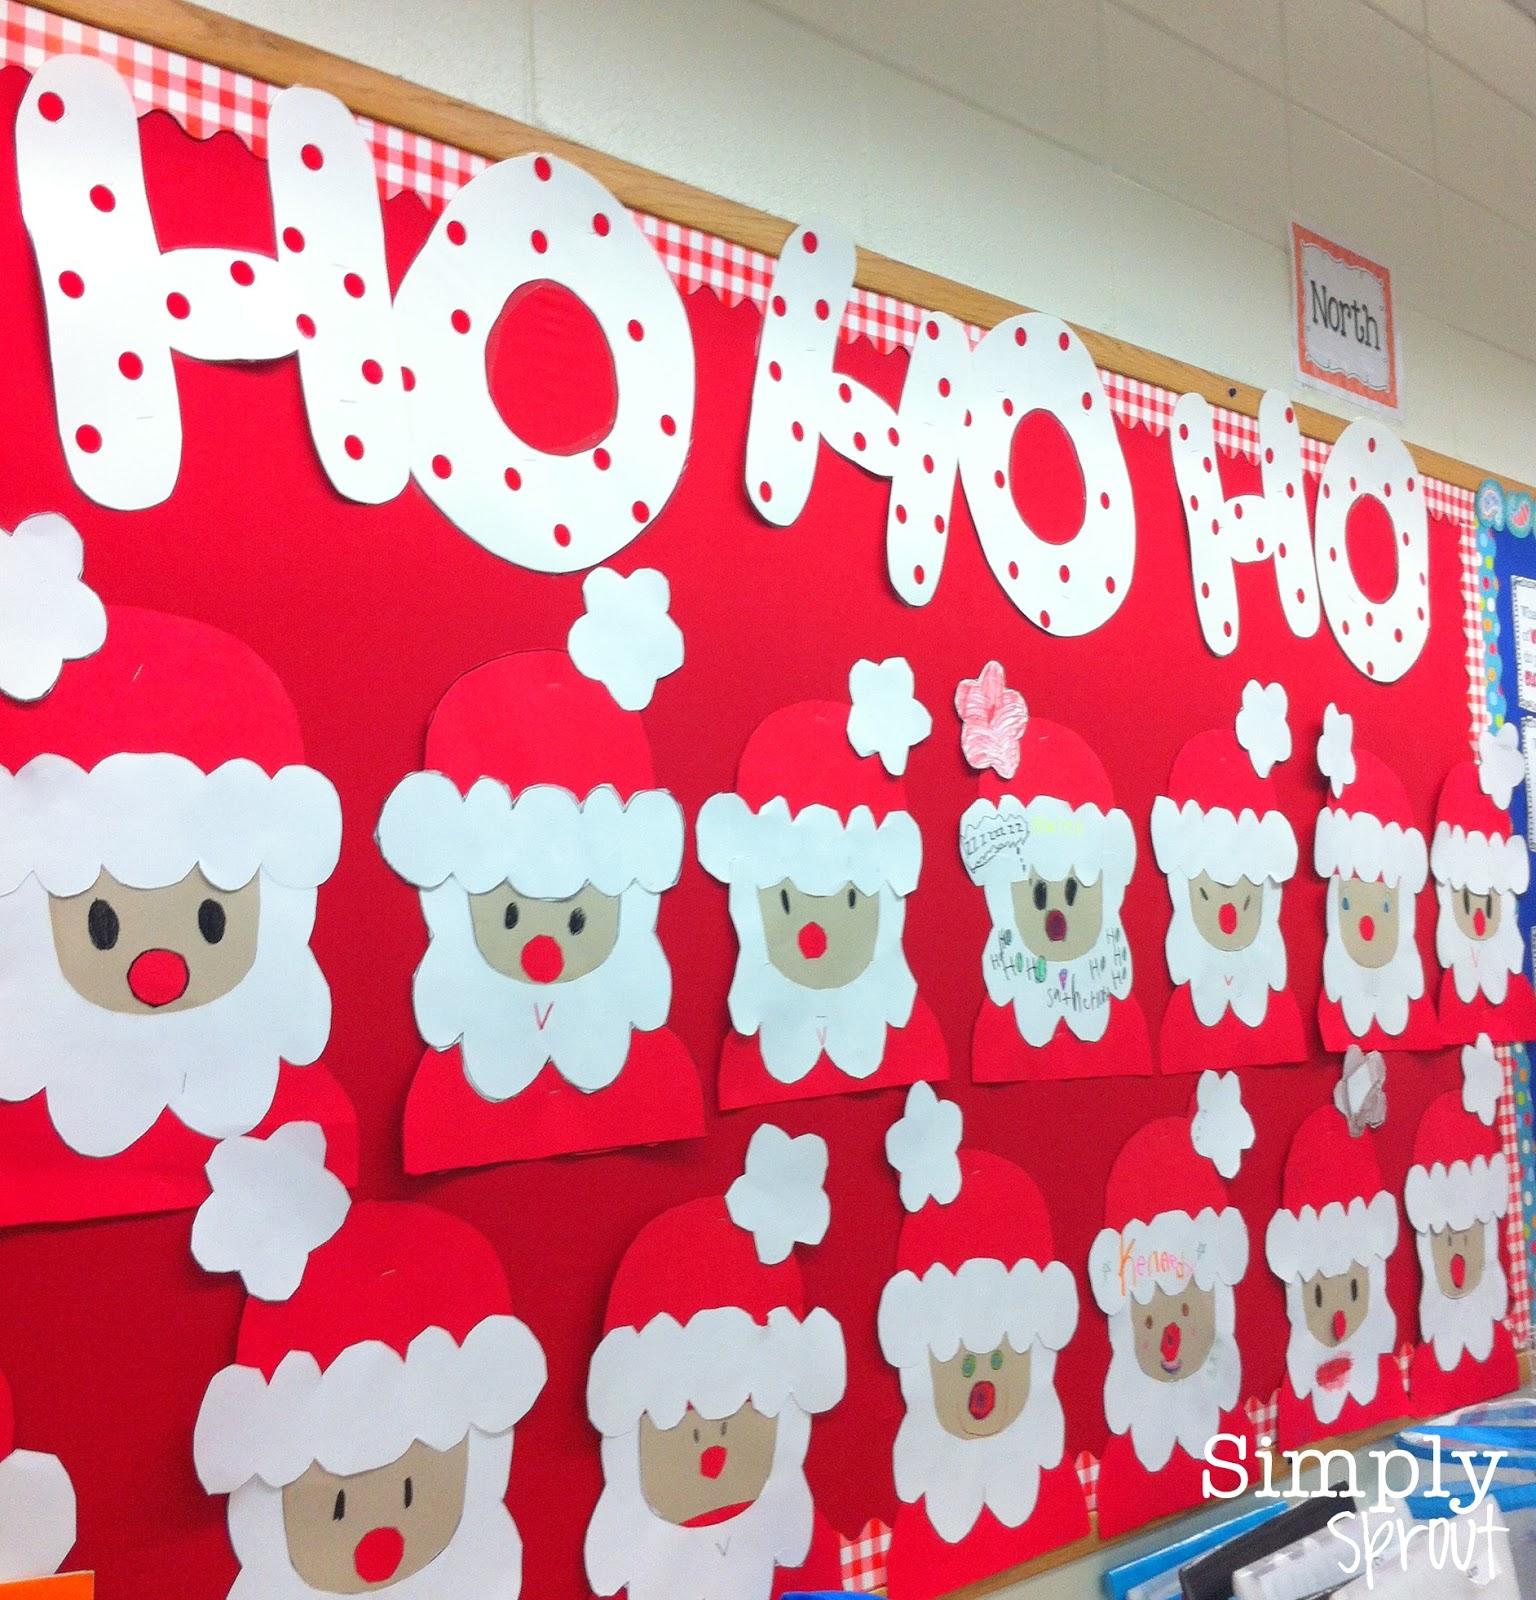 Board Decoration For Christmas: Month Of Joy: Santa Spotting